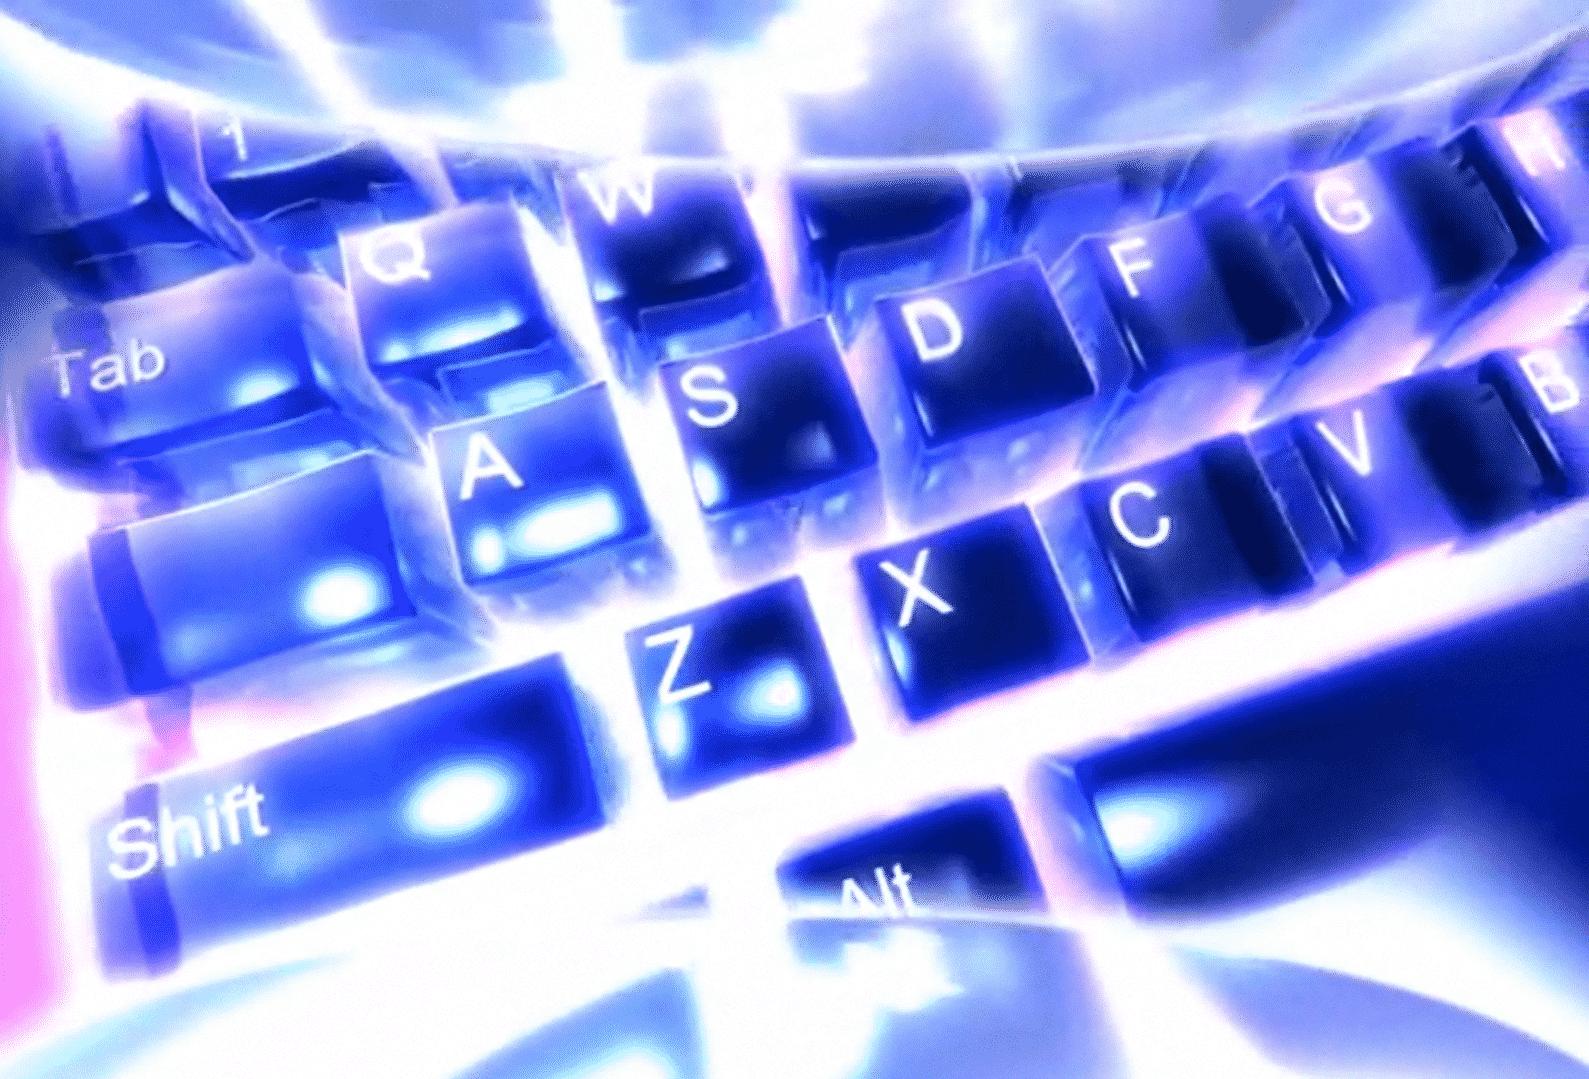 Keyboard Shortcuts from Windows to Macs